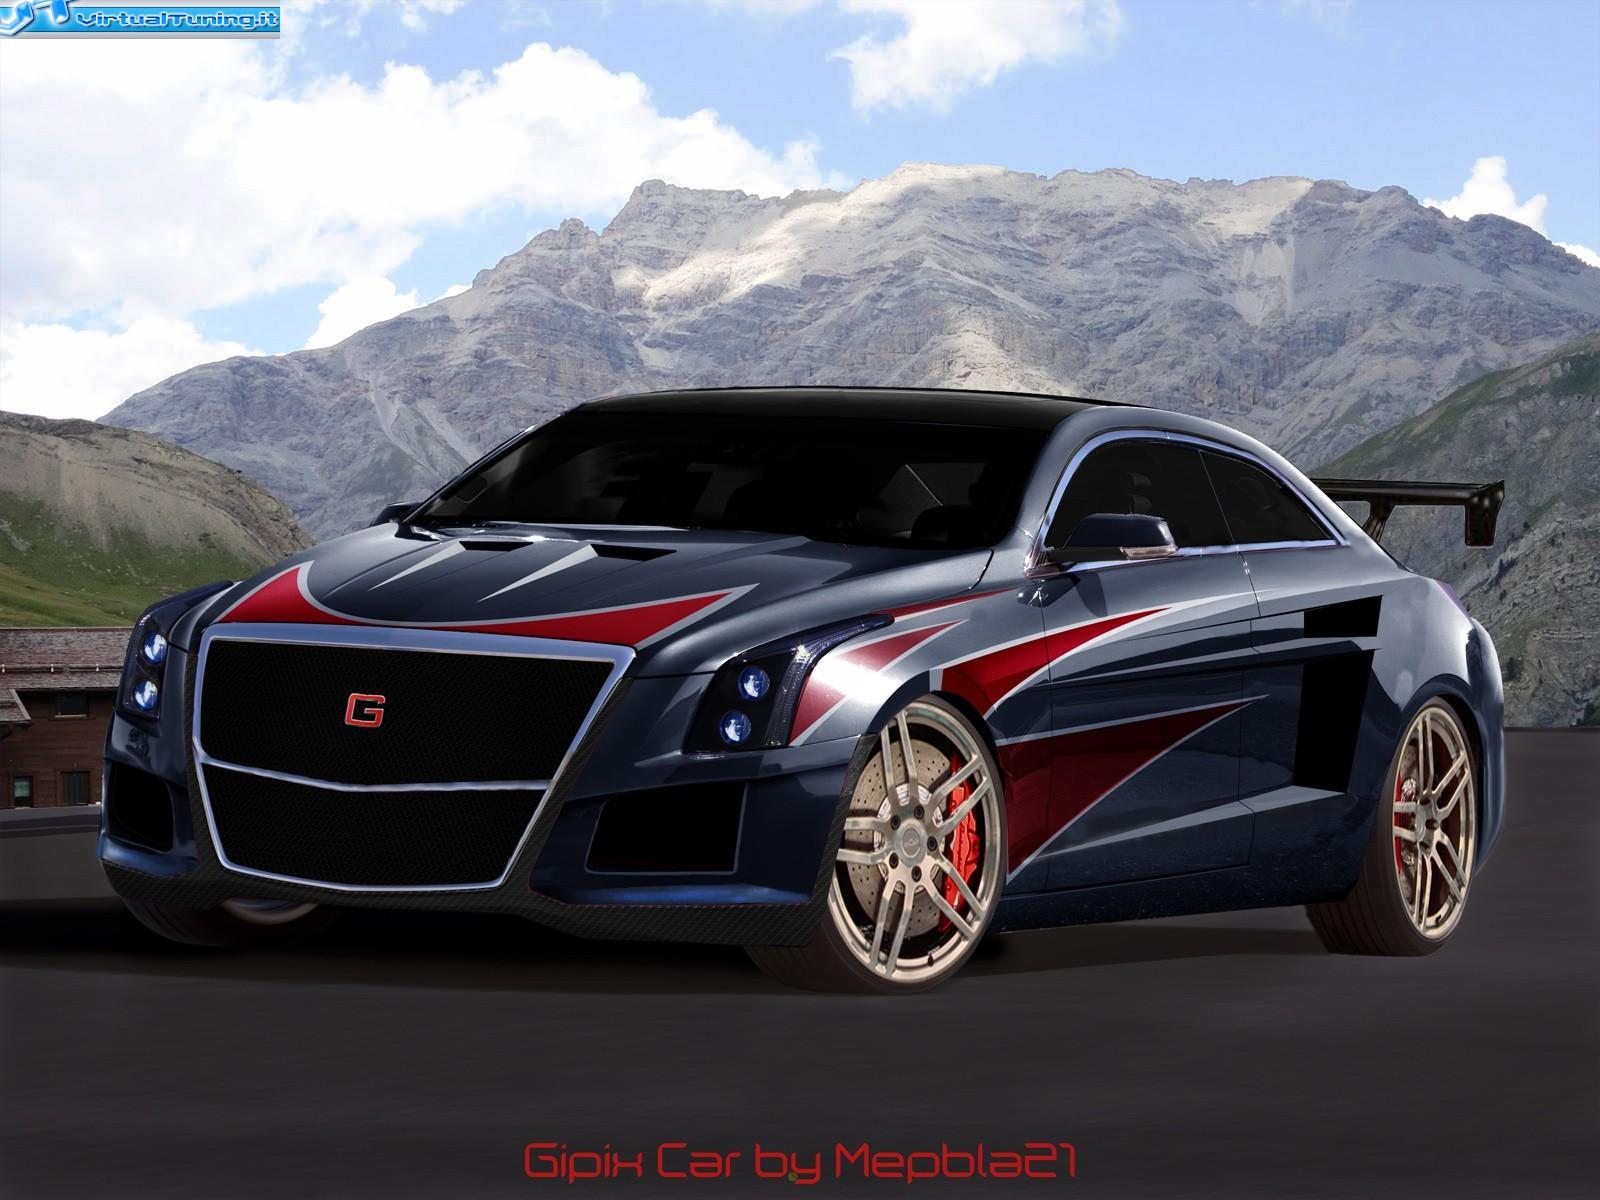 2013 Cadillac Ats D3